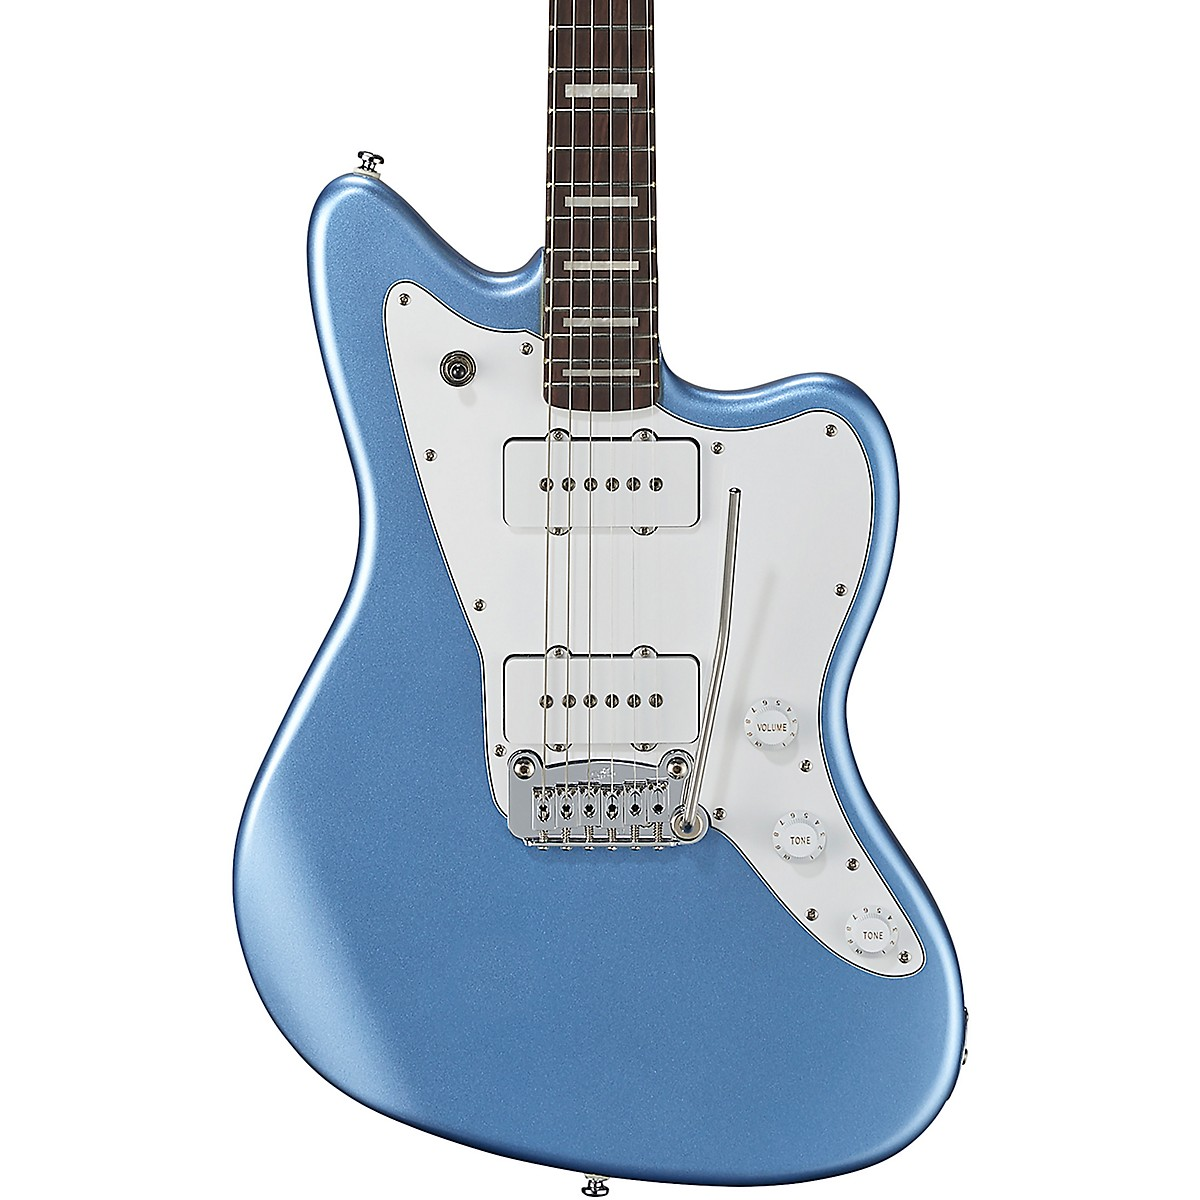 G&L Tribute Doheny Electric Guitar Brazilian Cherry Fingerboard